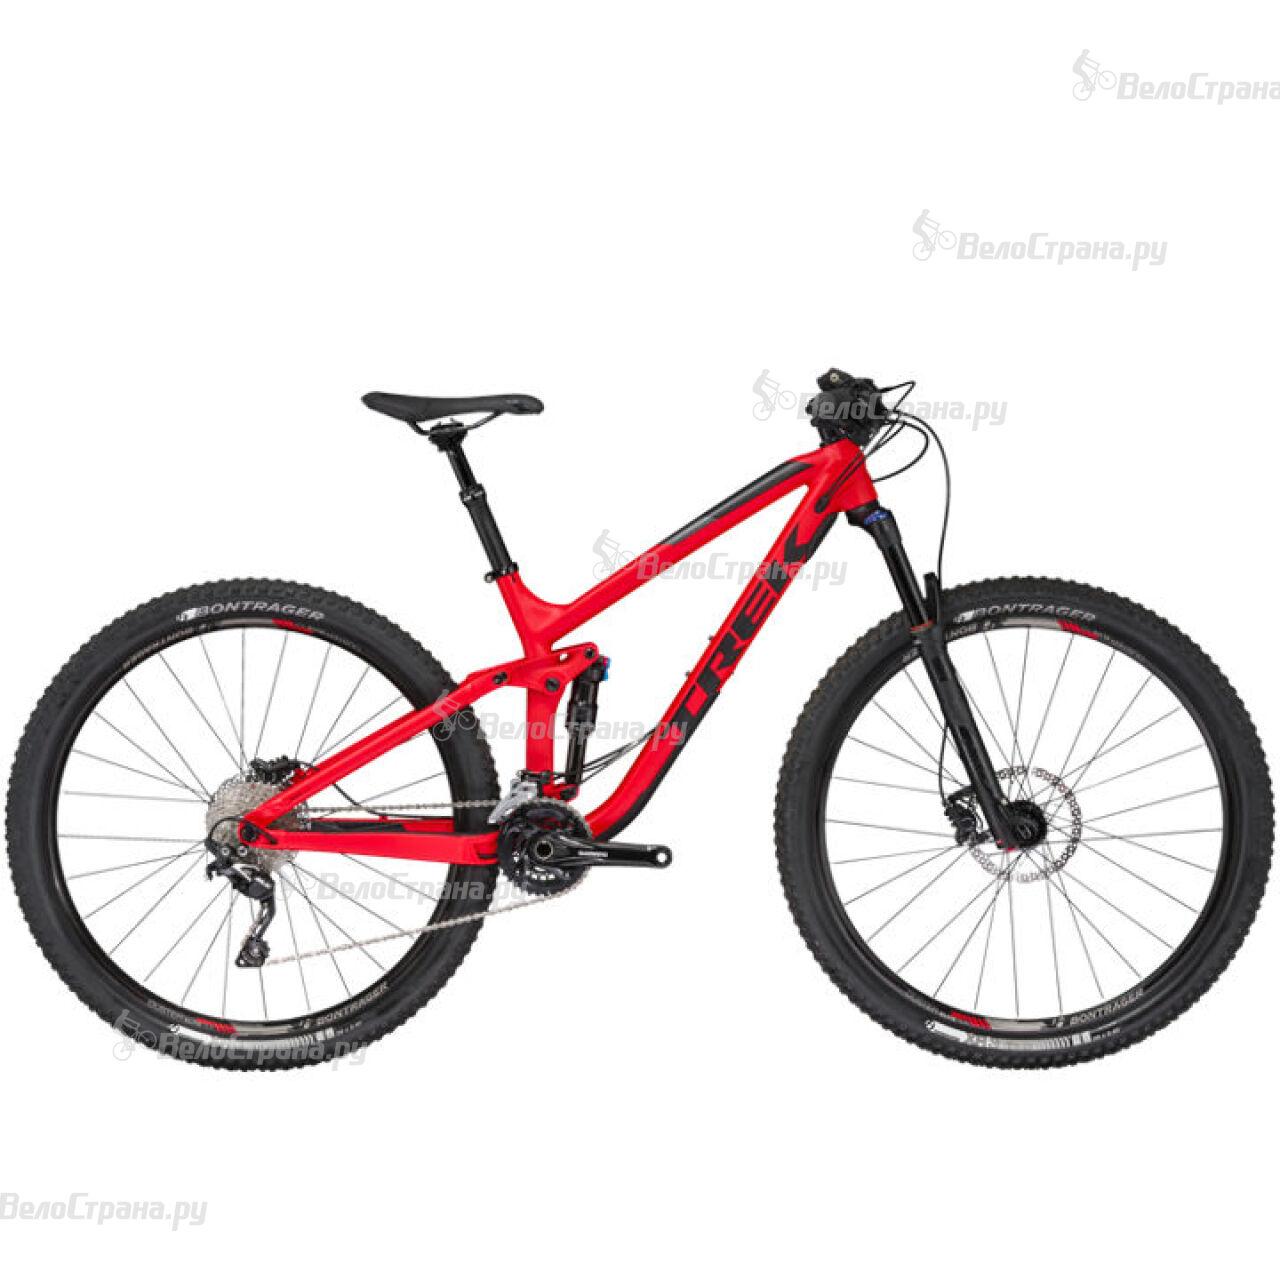 Велосипед Trek Fuel EX 7 29 (2017) trek fuel ex 9 27 5